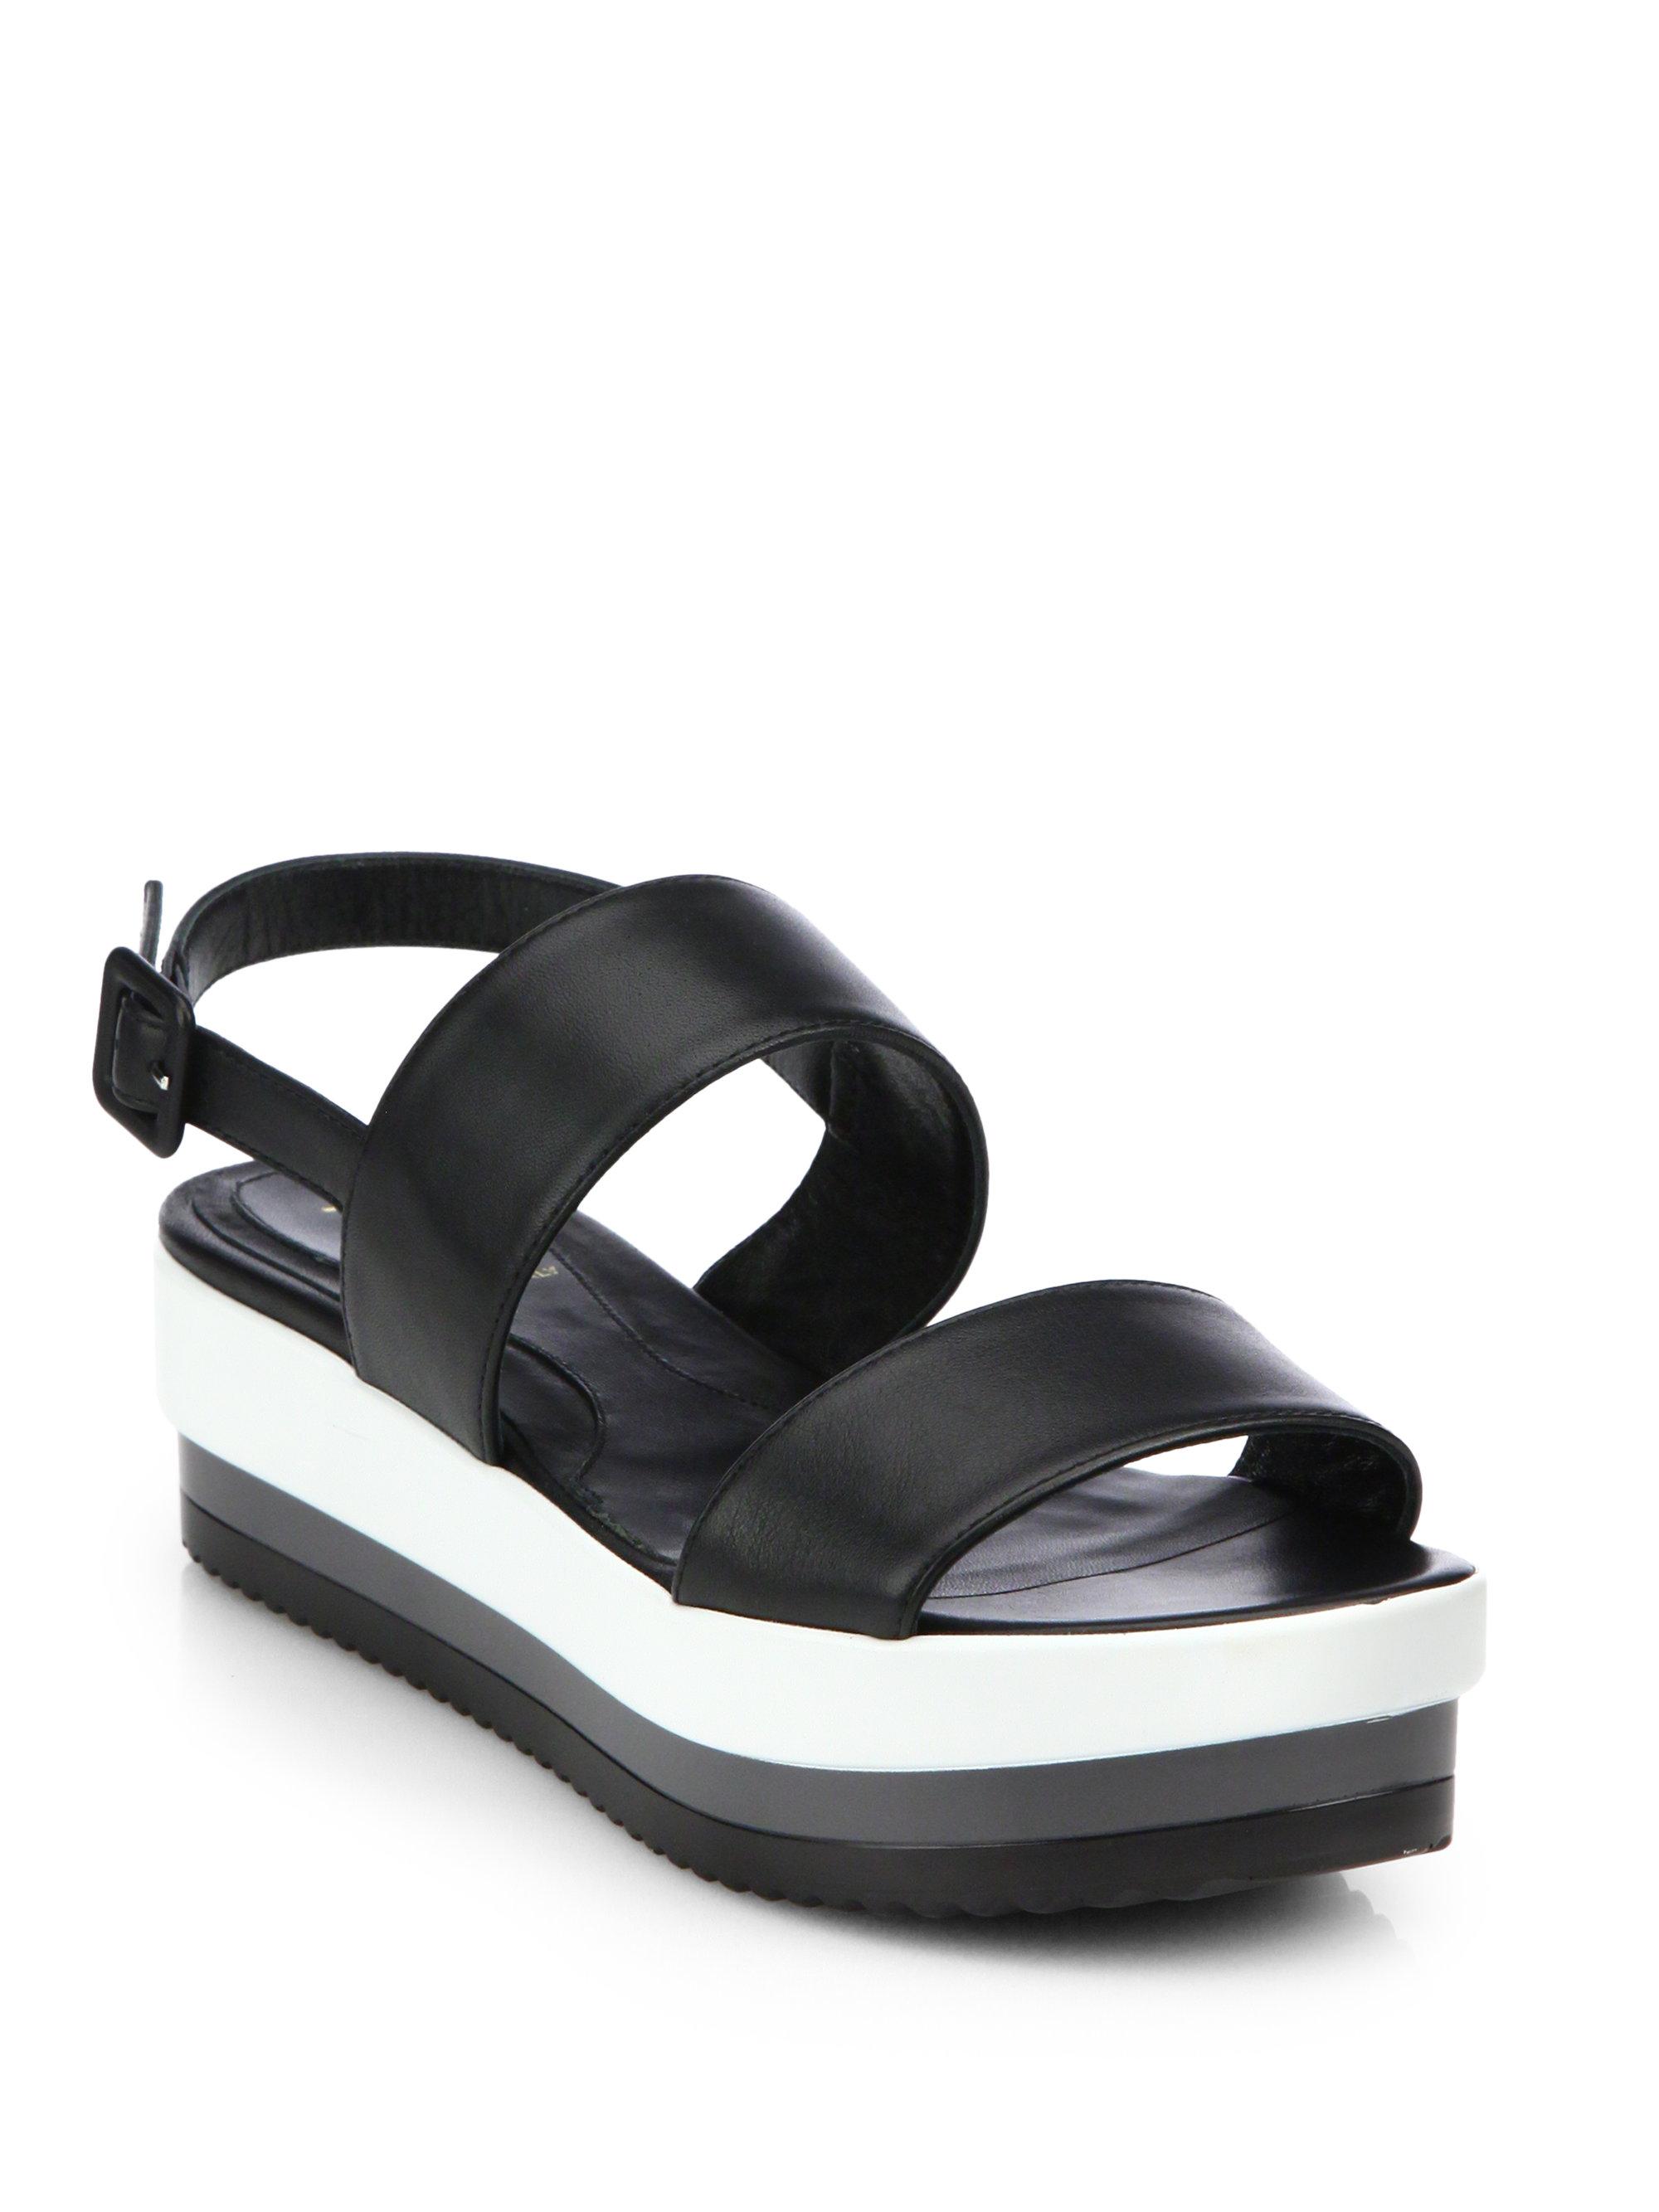 S Inspired Platform Shoes